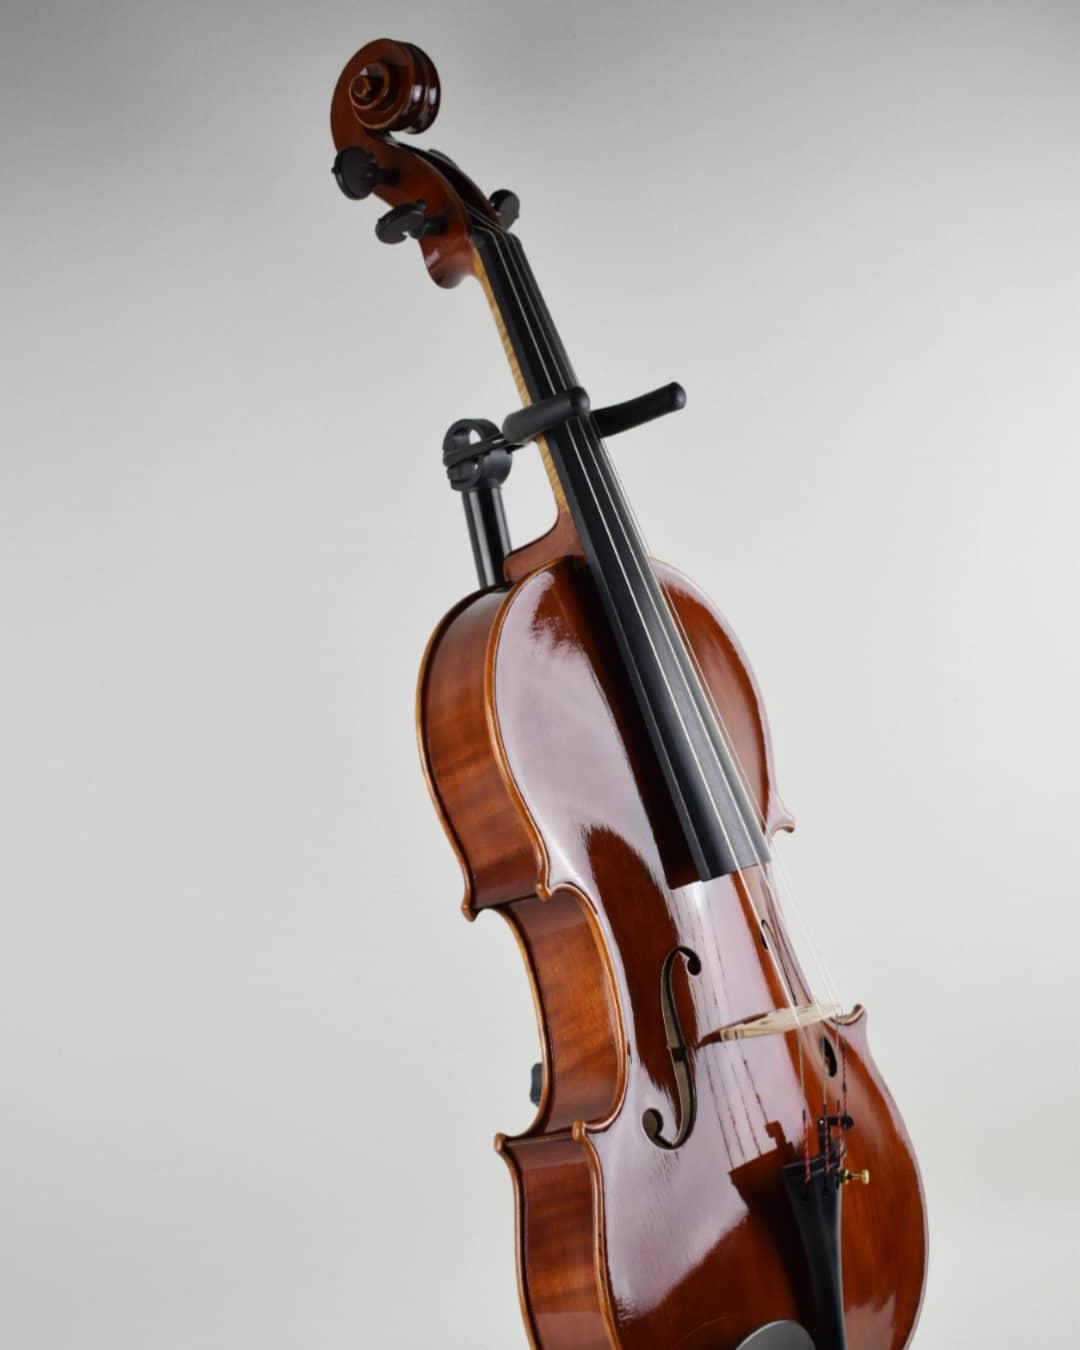 Viola 41CM 2021#沖縄 #琉球 #violin #viola #cello #doublebass #バイオリン #ビオラ #チェロ #コントラバス #ryukyu #okinawa